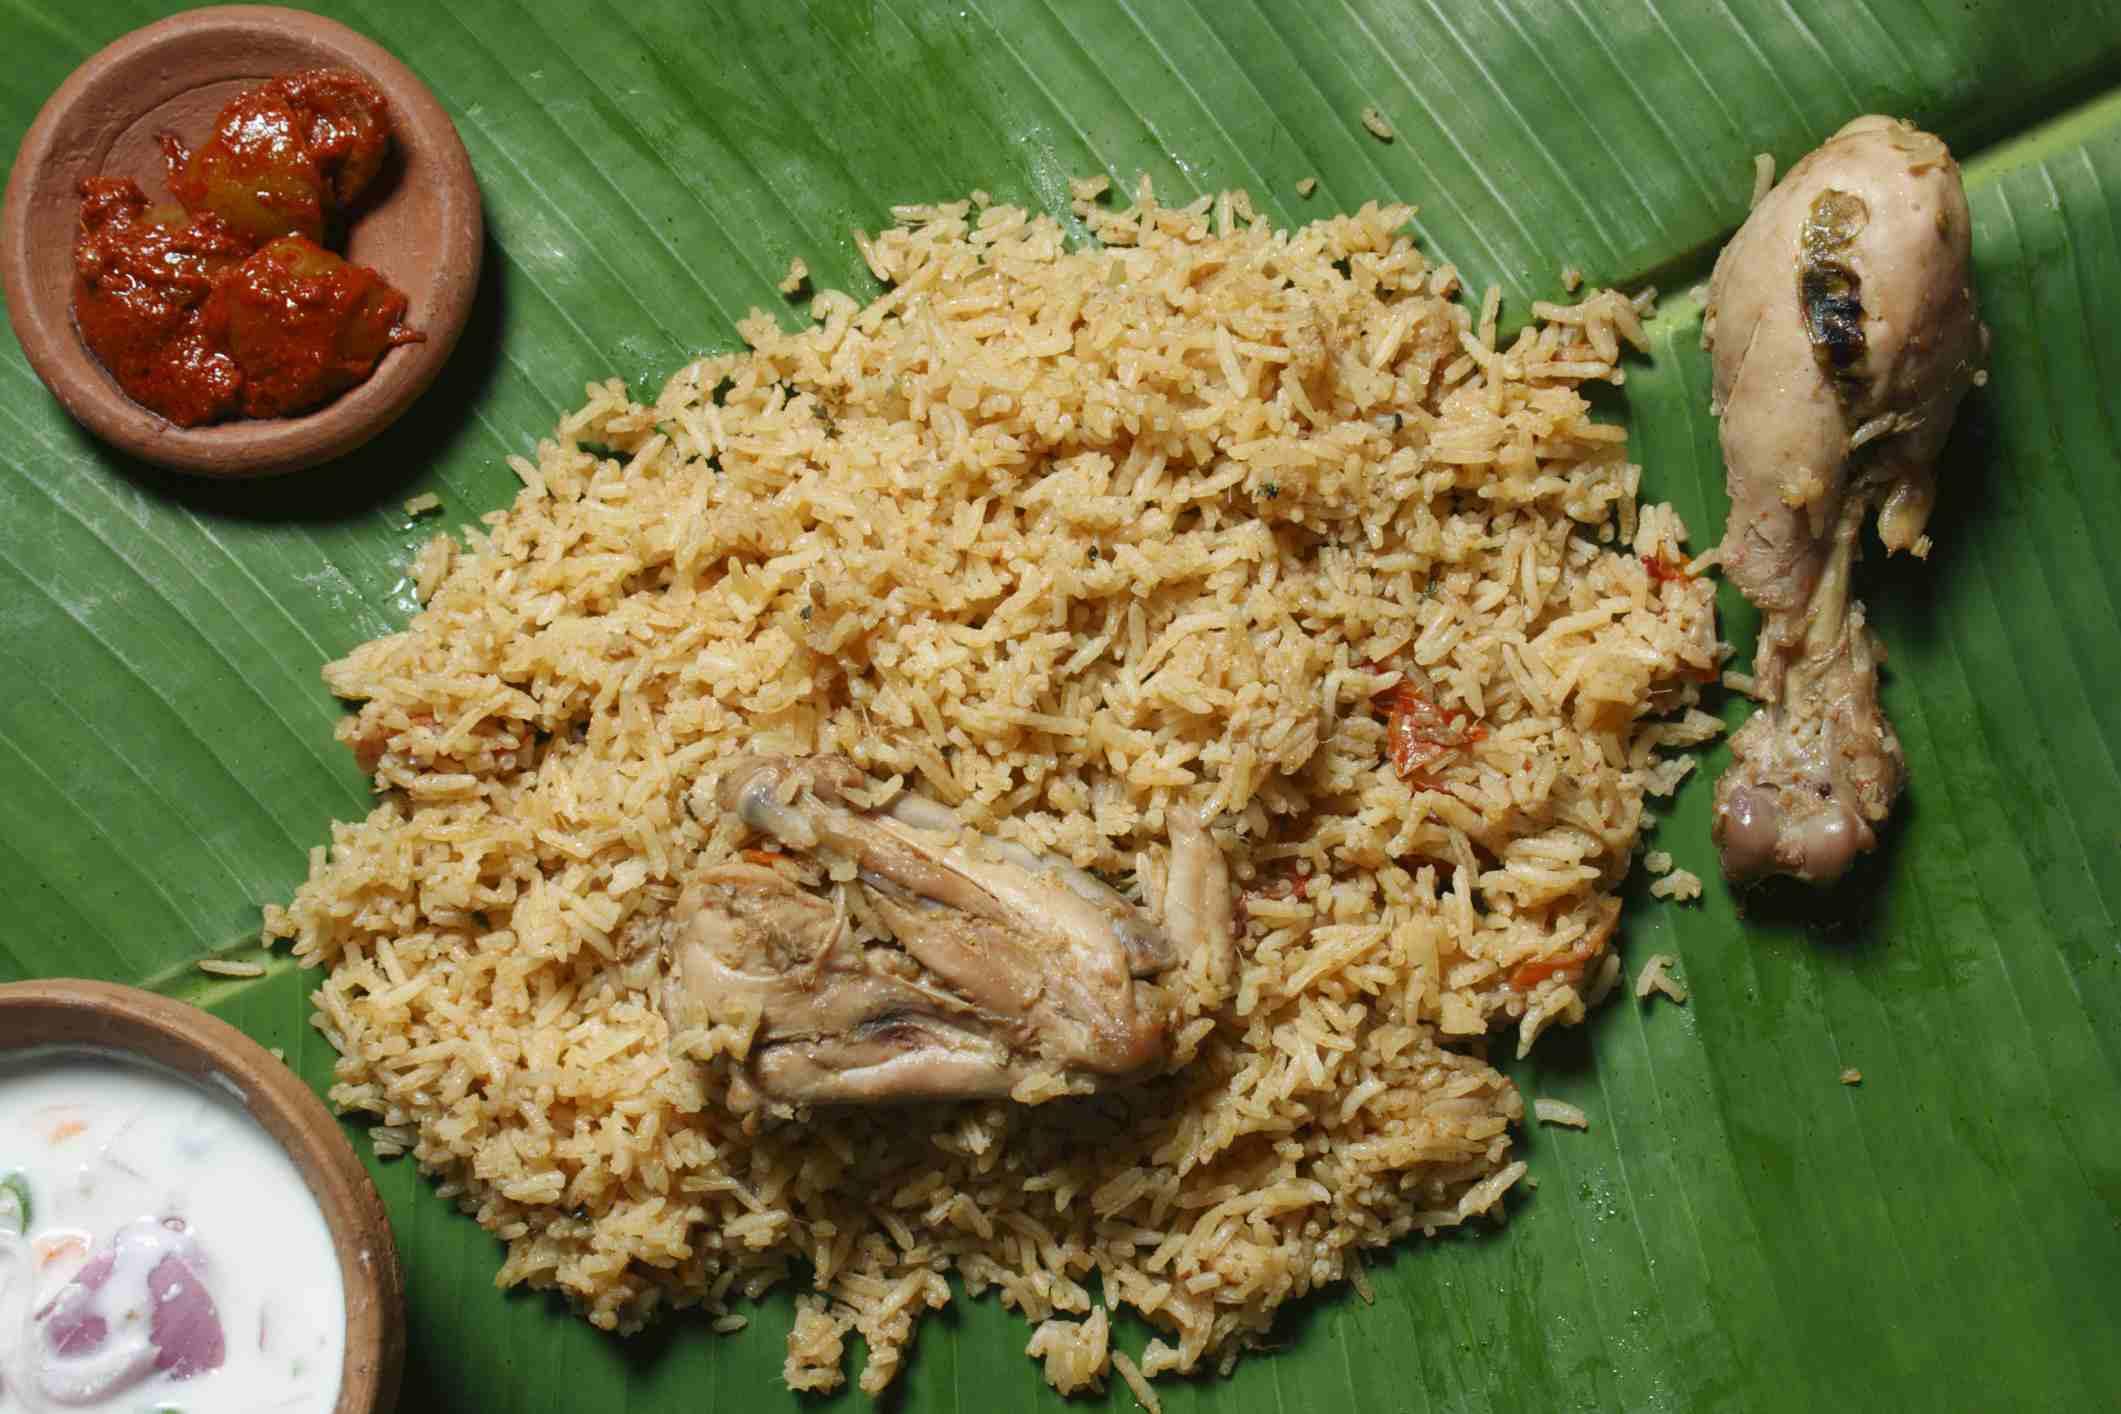 Kerala biryani